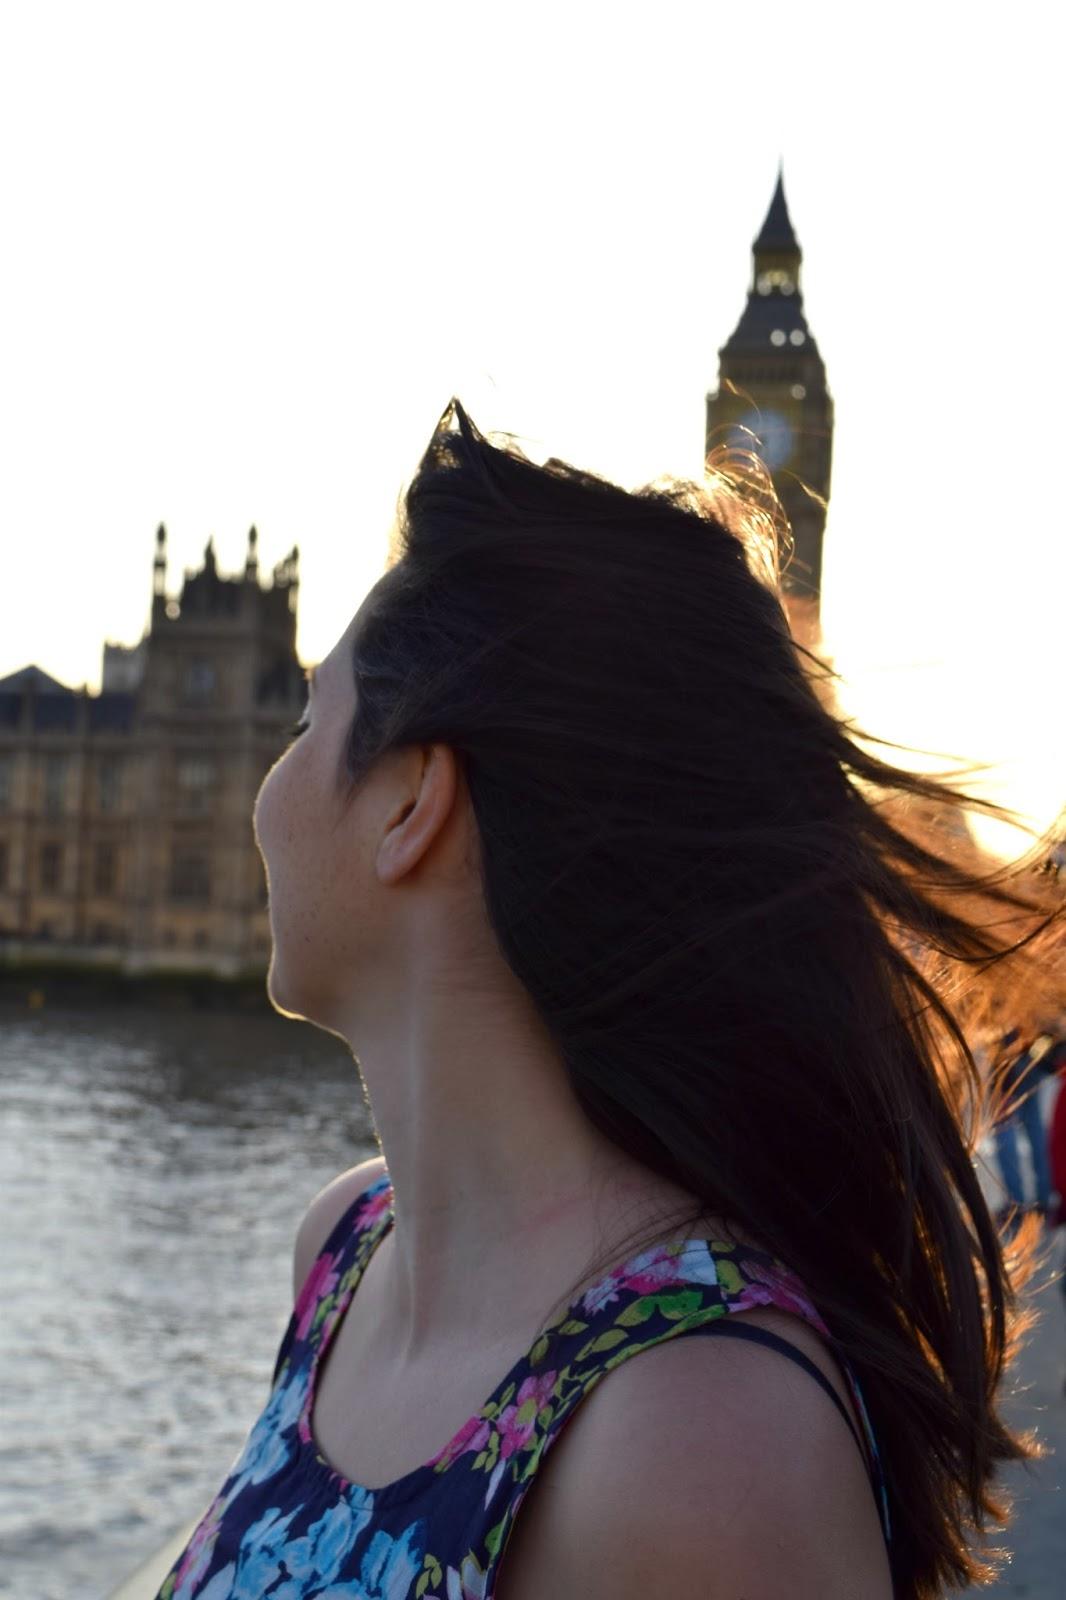 Westminster Bridge London. Big Ben. Expat post.